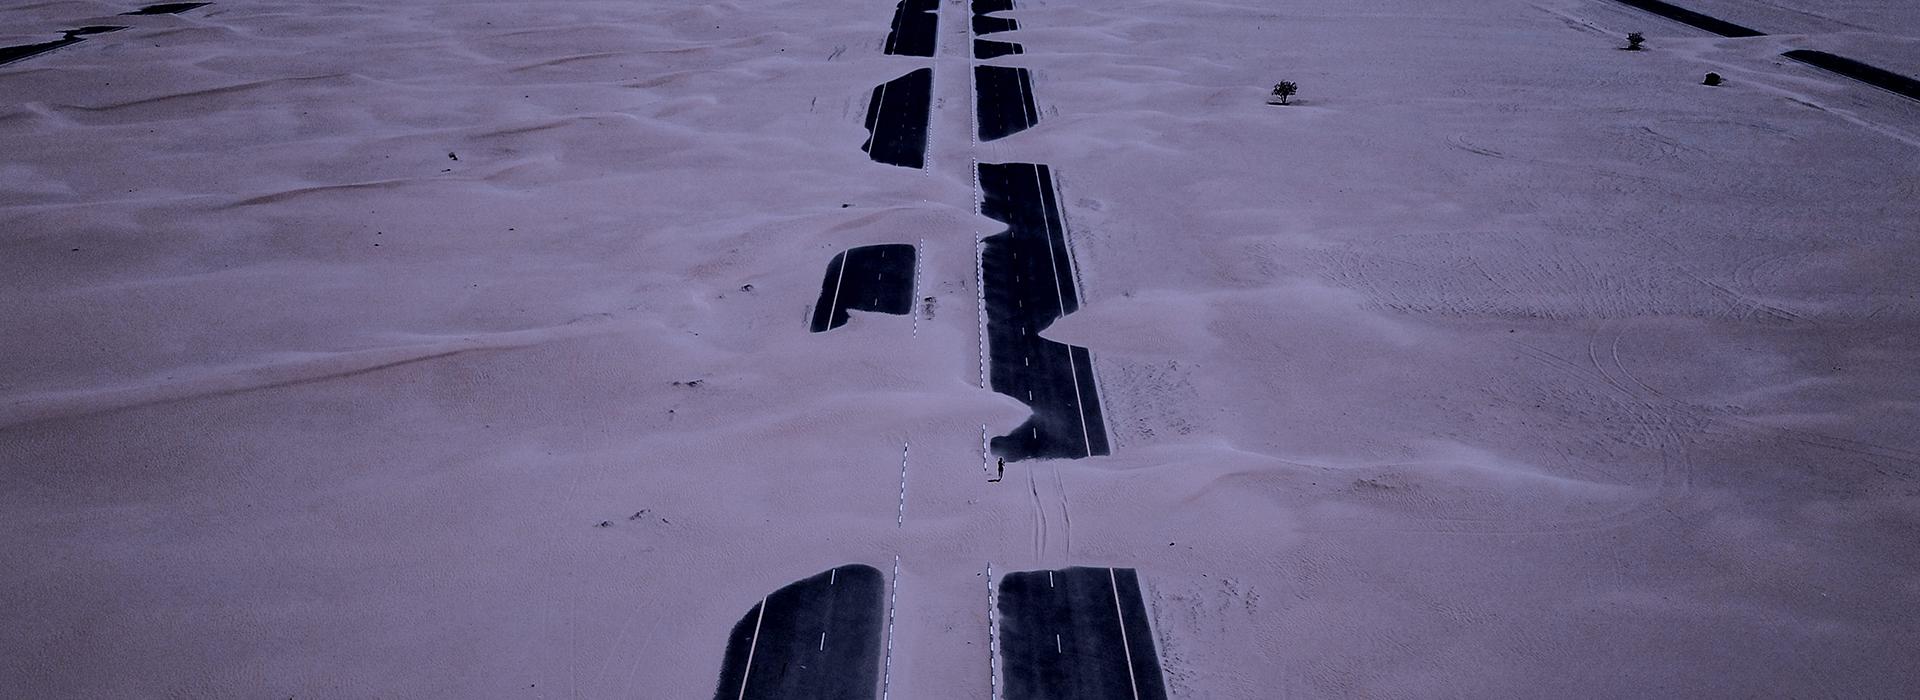 Pathway through the snow